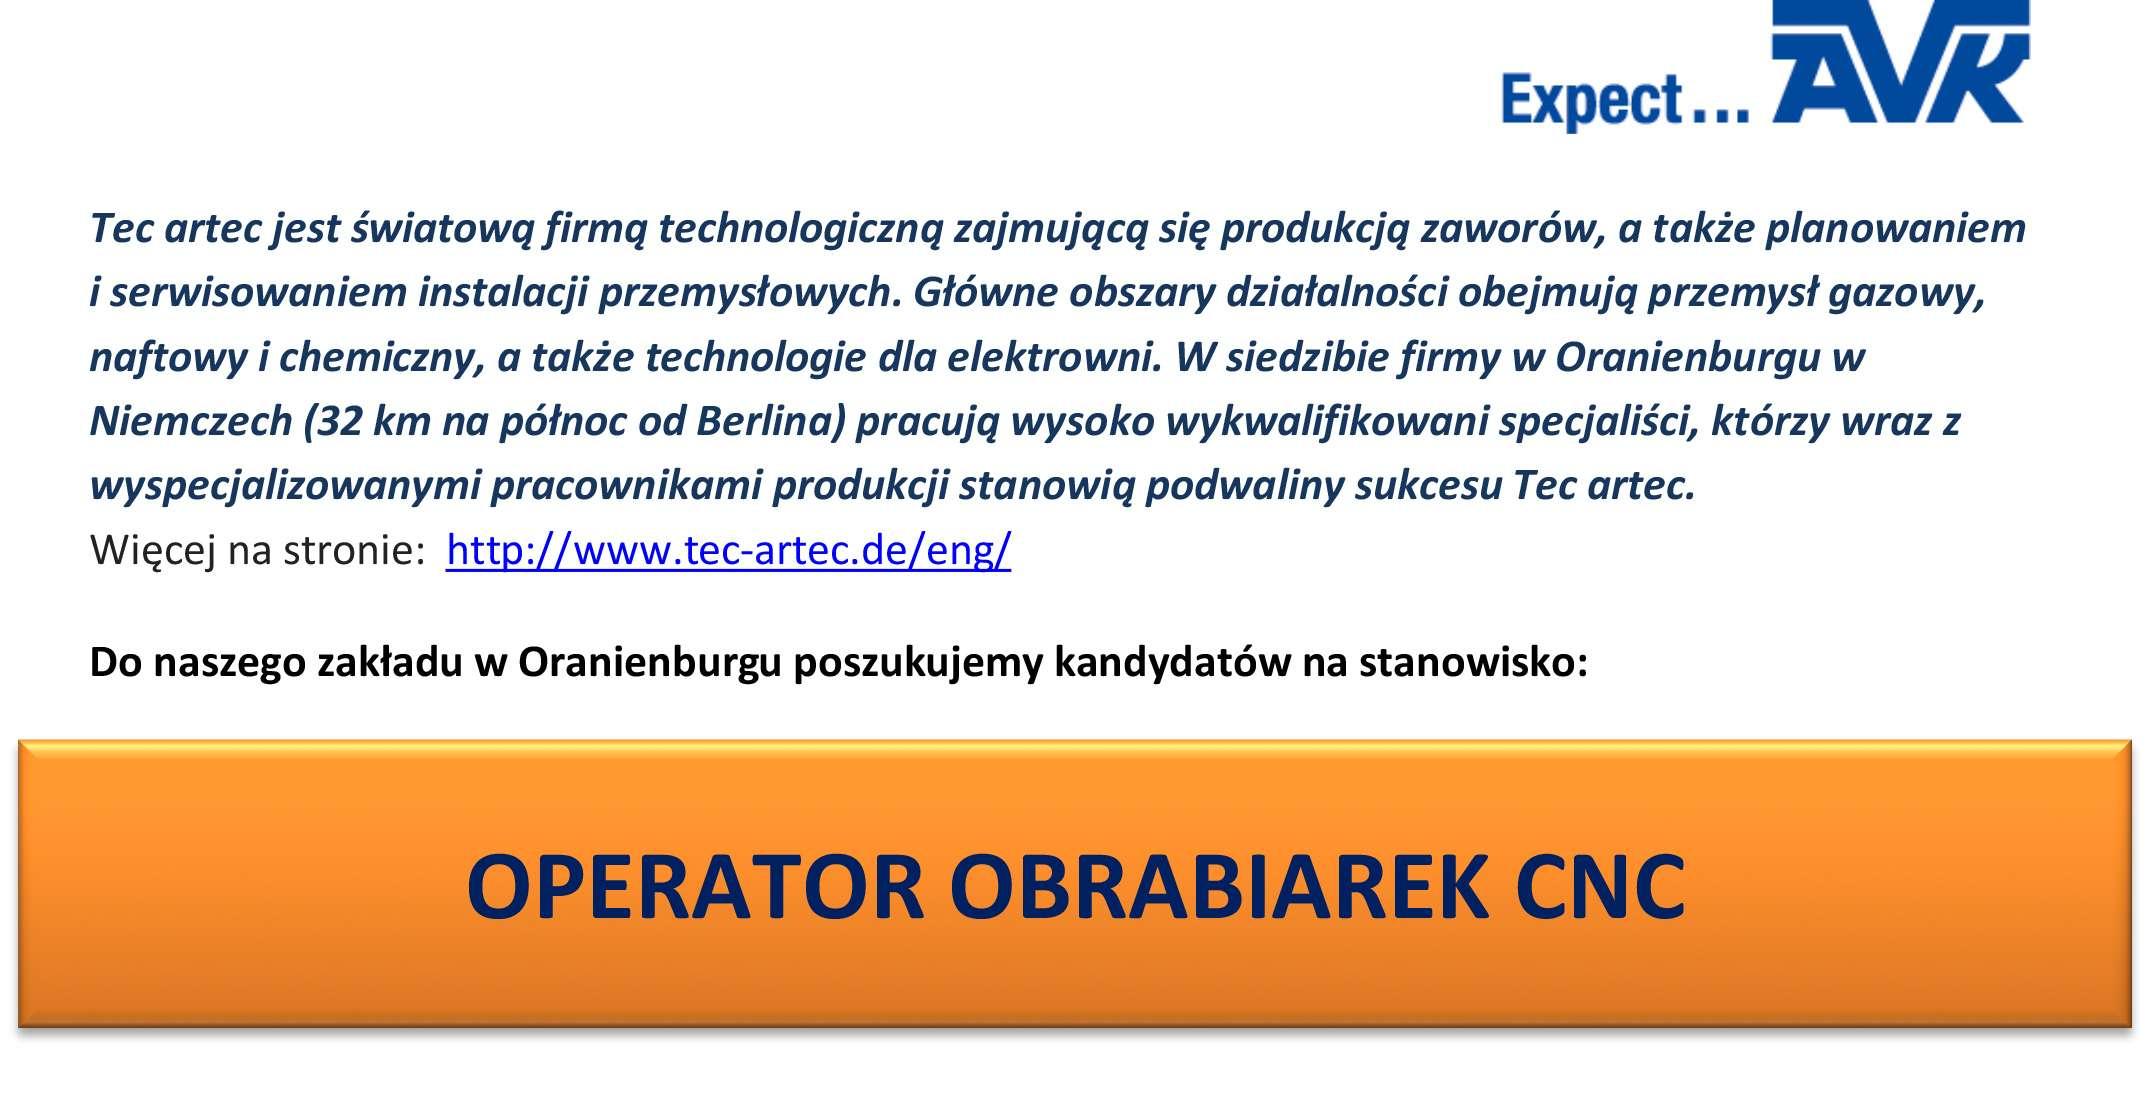 Praca dla operatora obrabiarek CNC